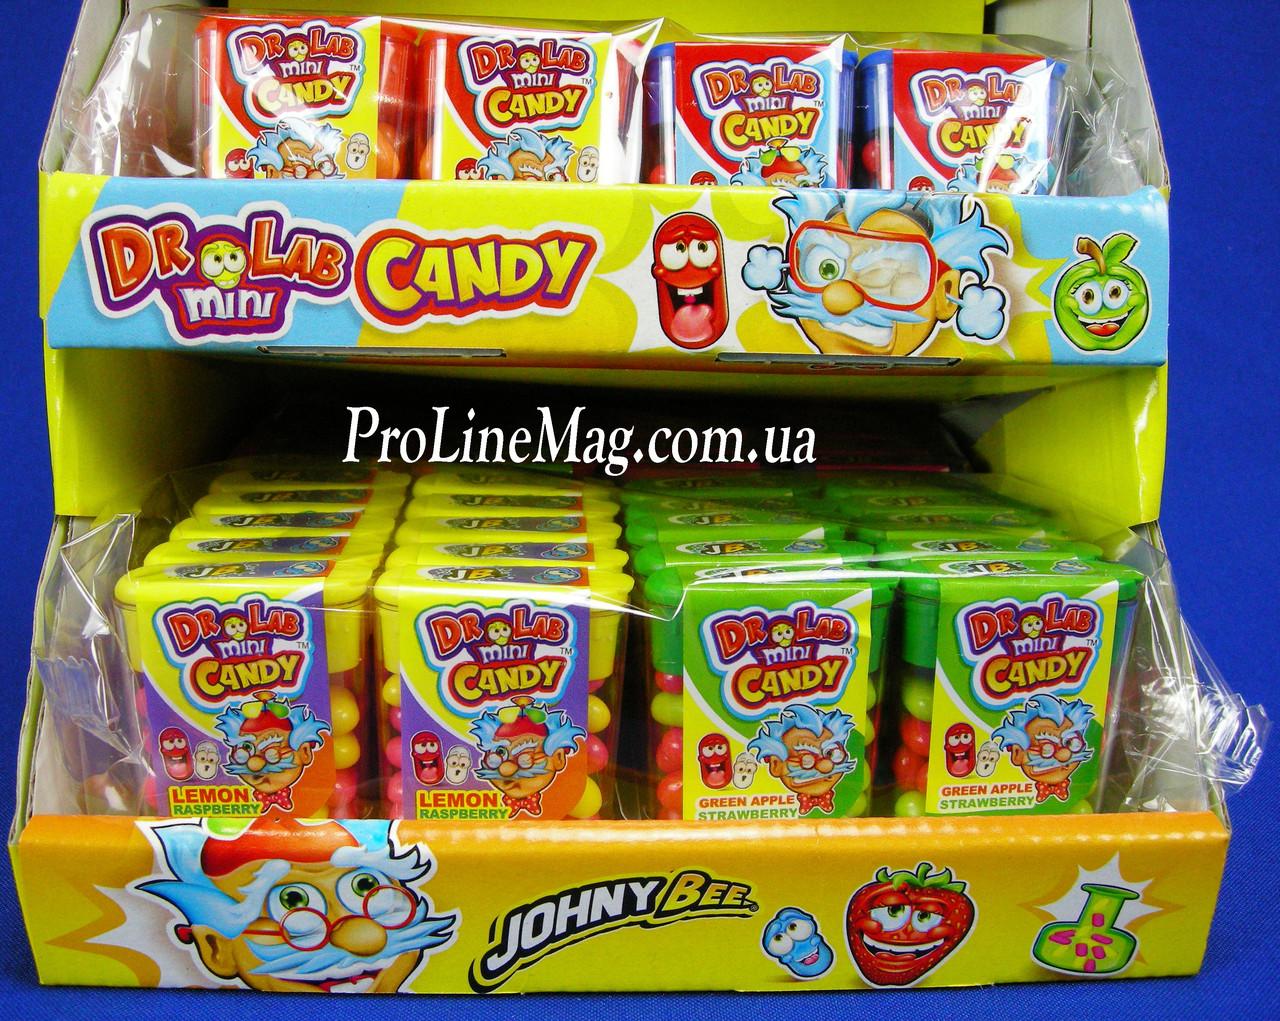 Конфеты - драже JOHNY BEE® Dr Lab Mini Candy+ Stand